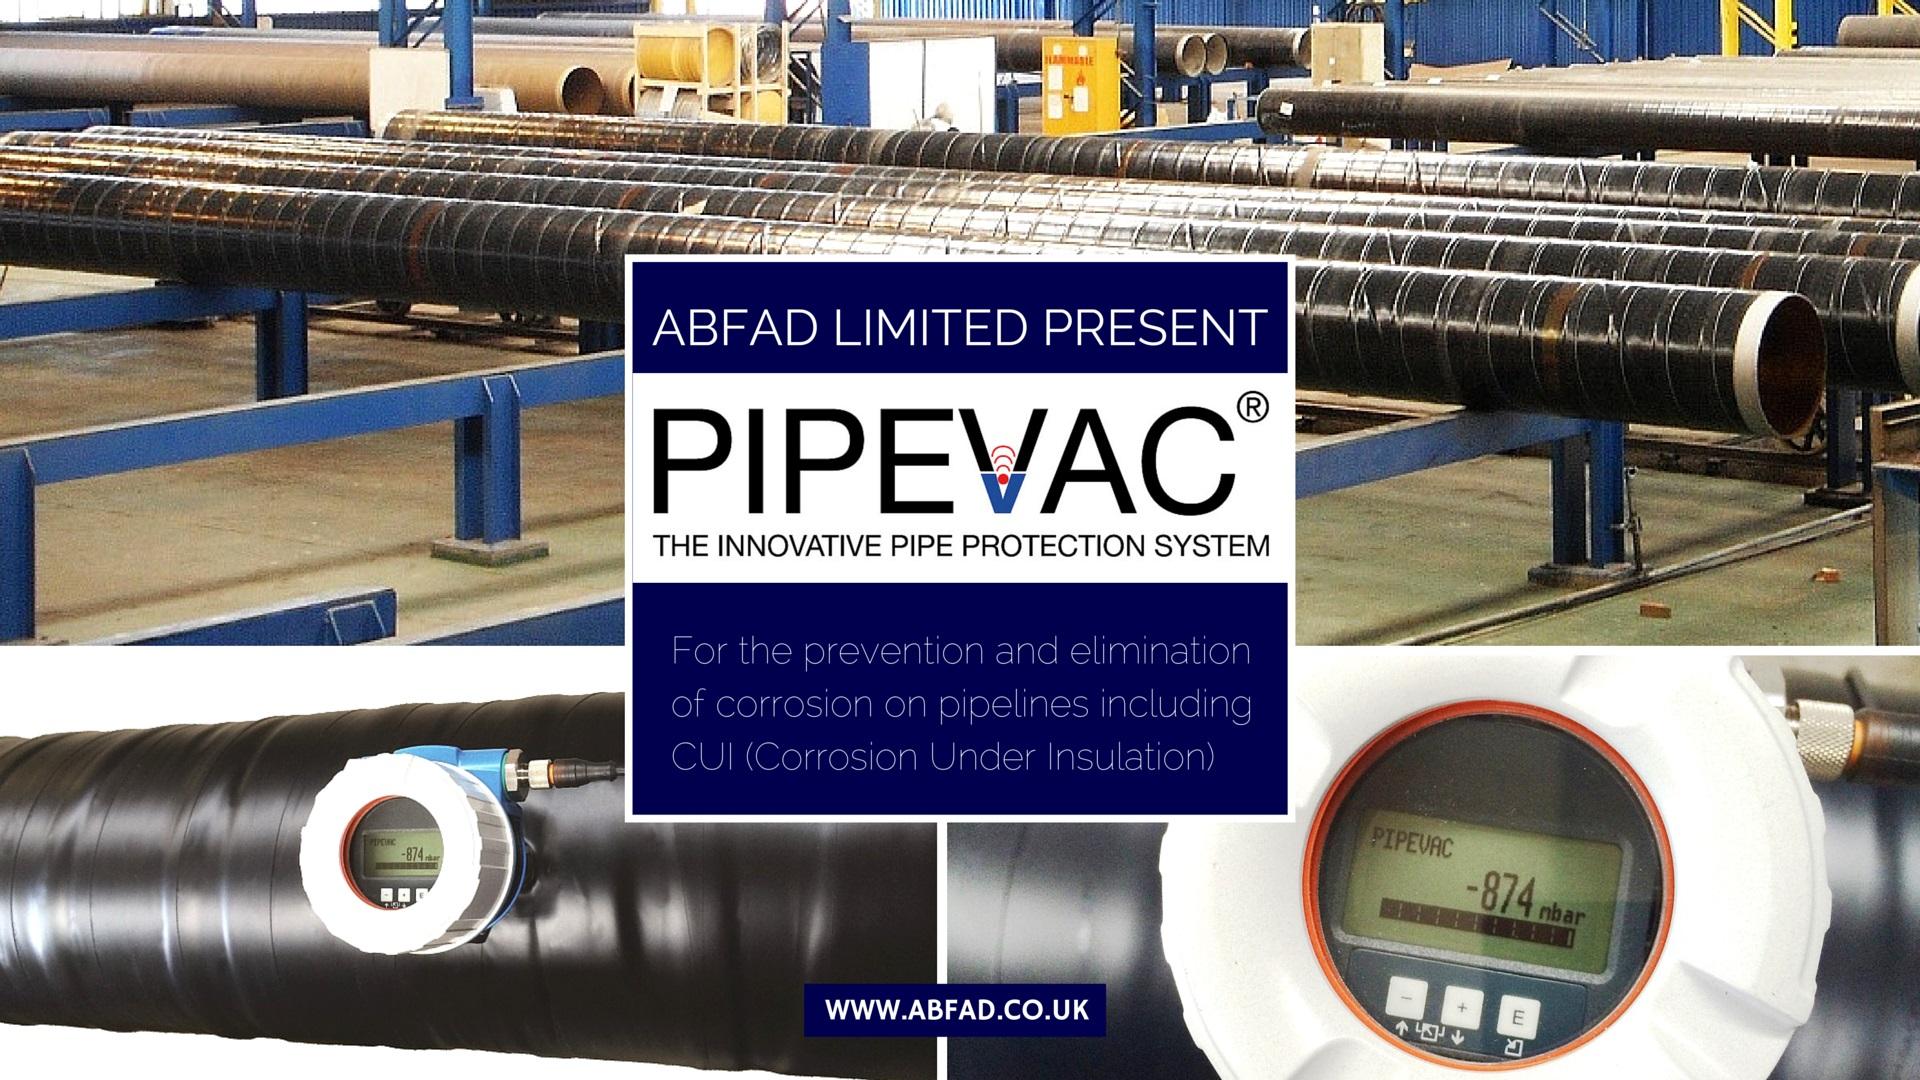 Pipevac promo download